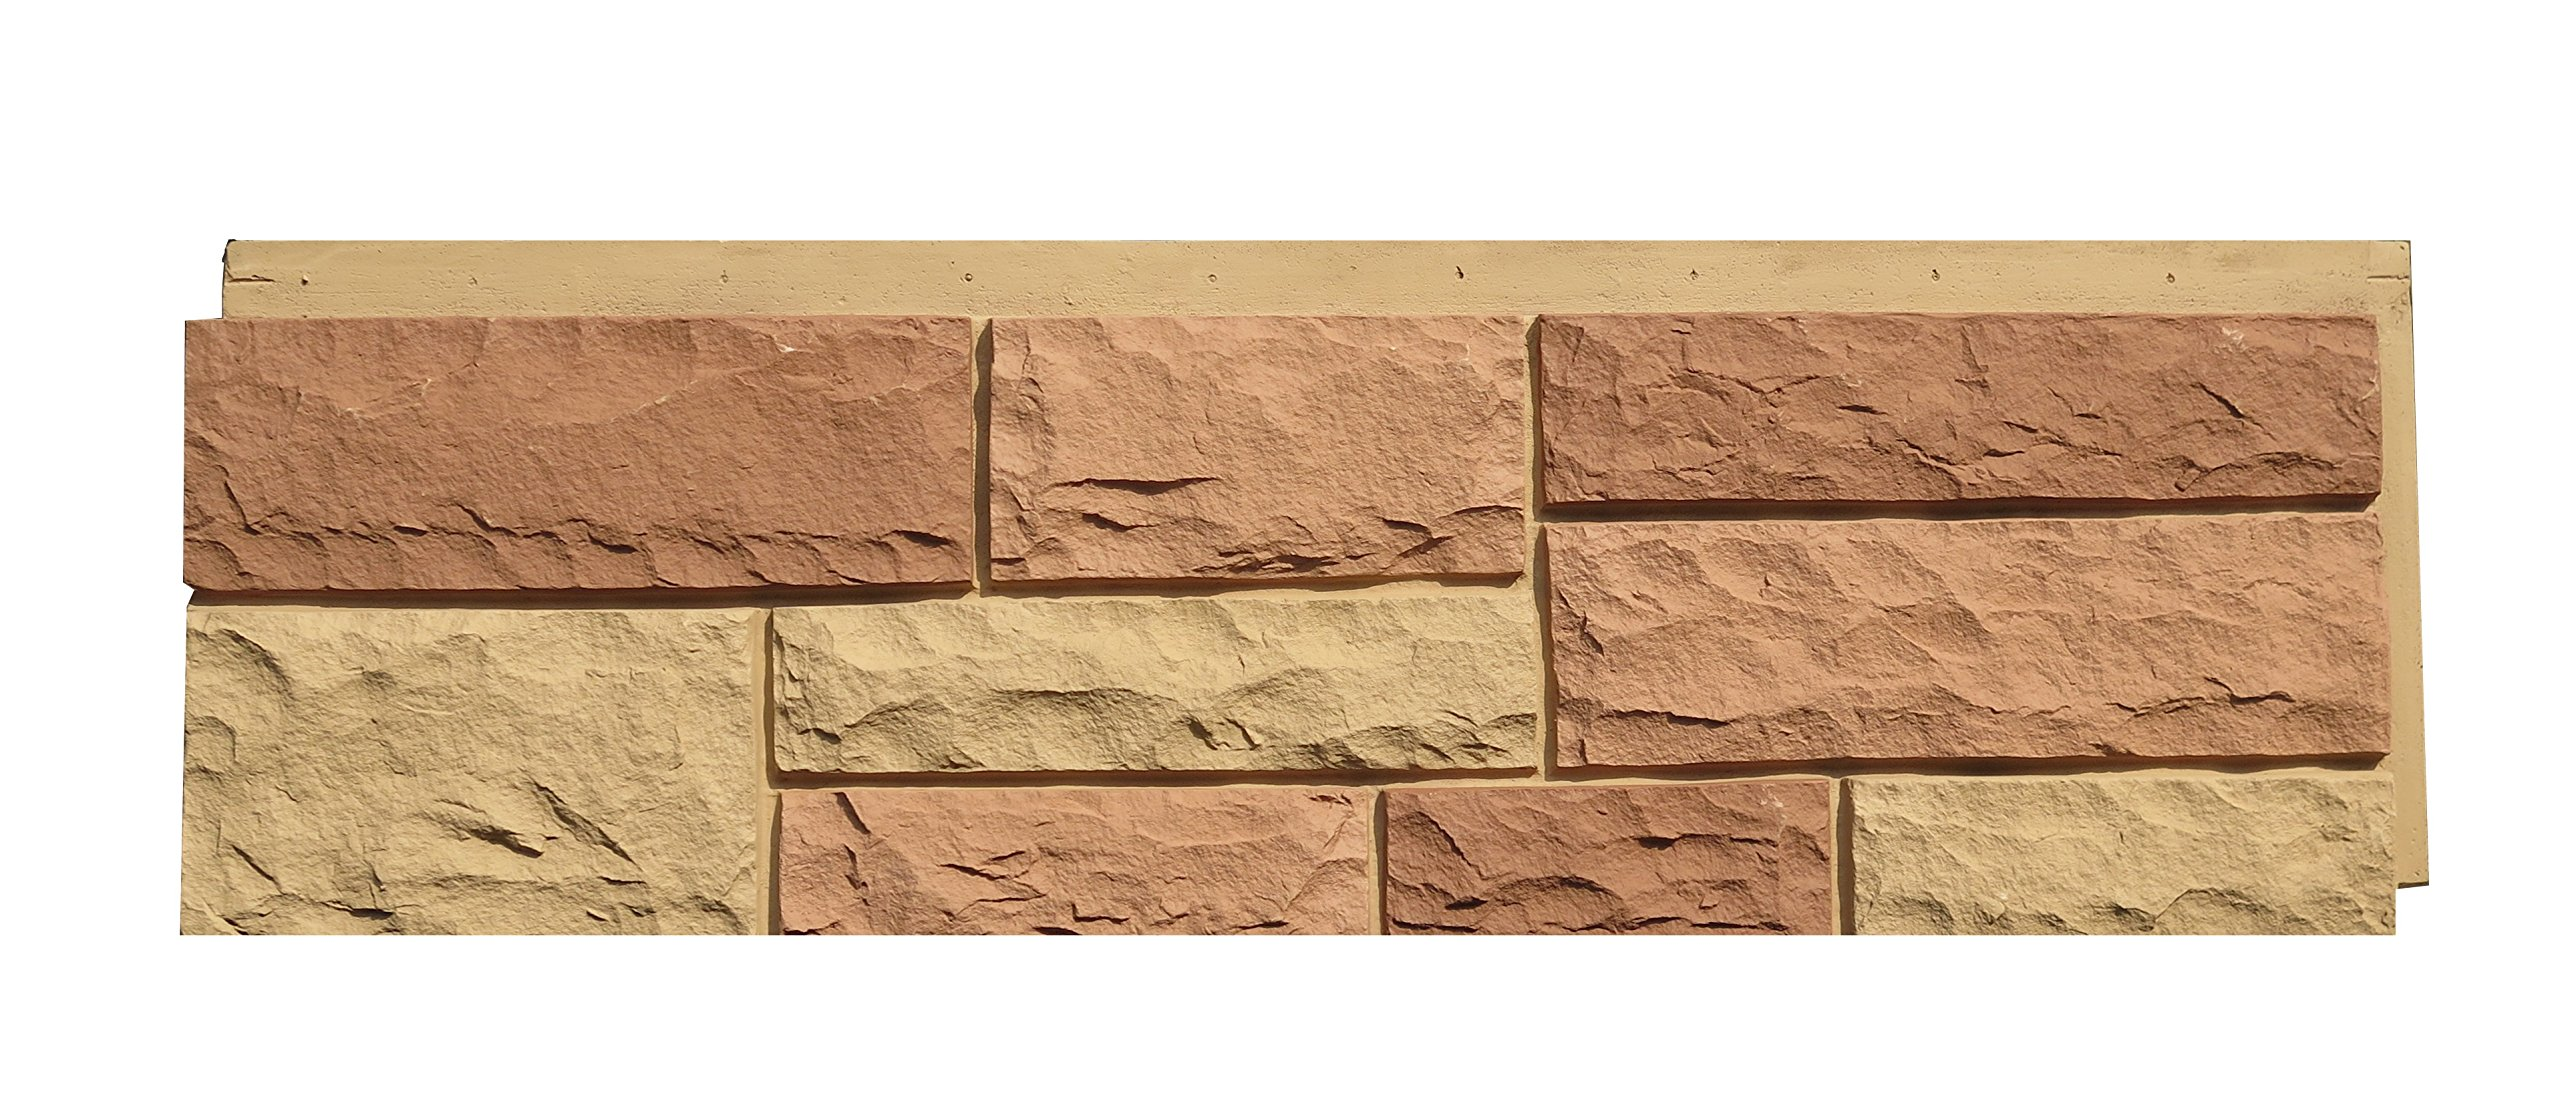 NextStone 6NPTS1 Random Rock Indoor/Outdoor Siding Panel 4-Pack, Tri-Sedona Red